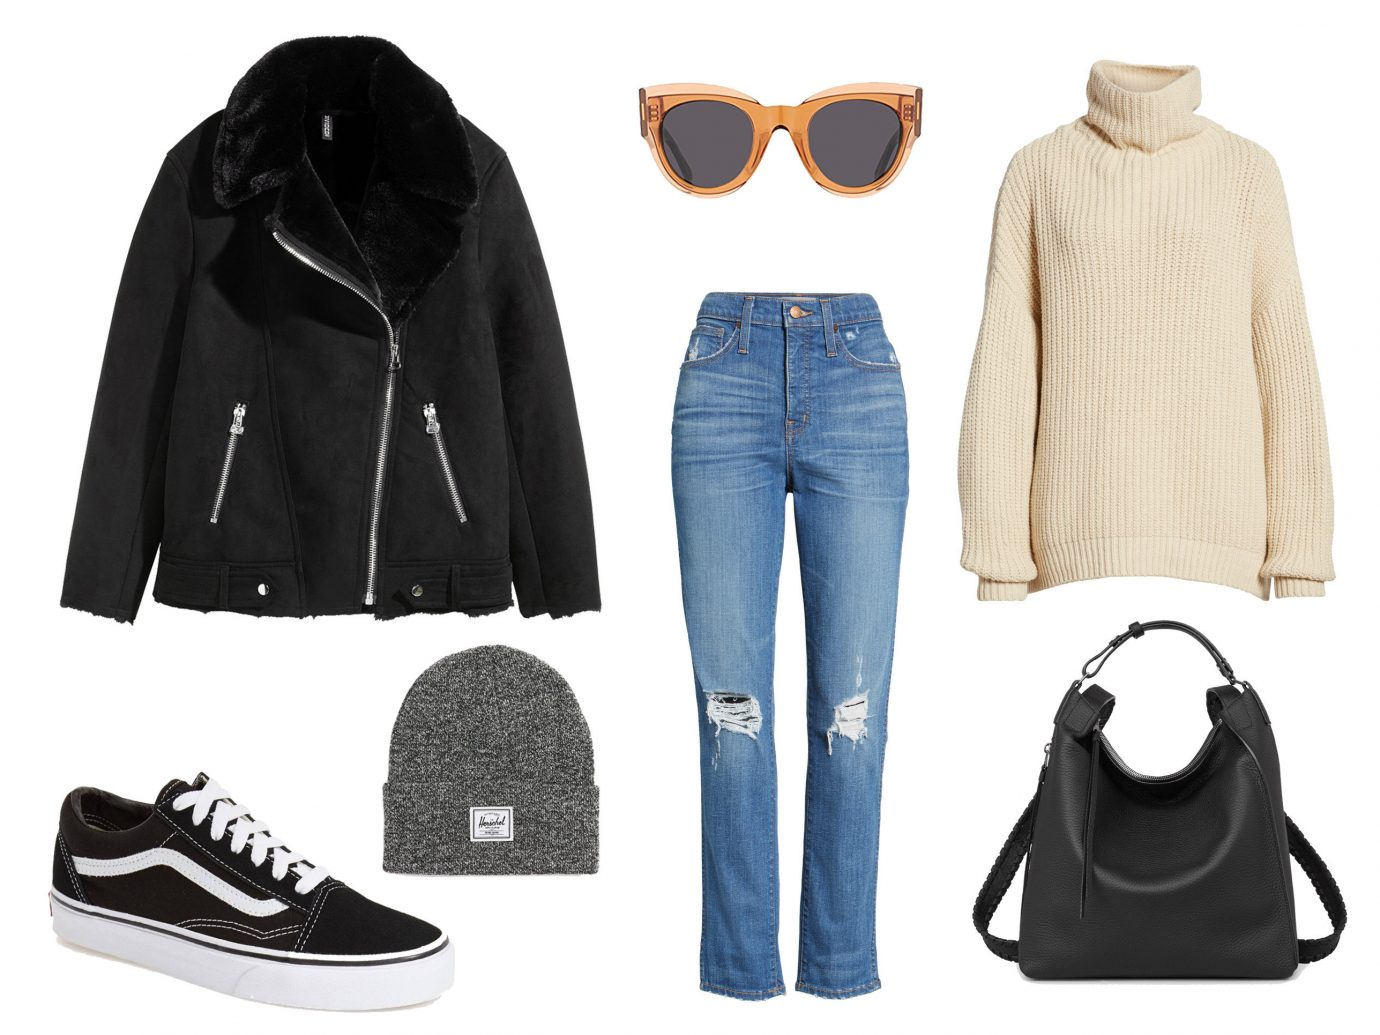 641aa21136a City Trip Ideas Weekend Getaways clothing fashion shoe outerwear jacket  product hood coat fur brand fashion